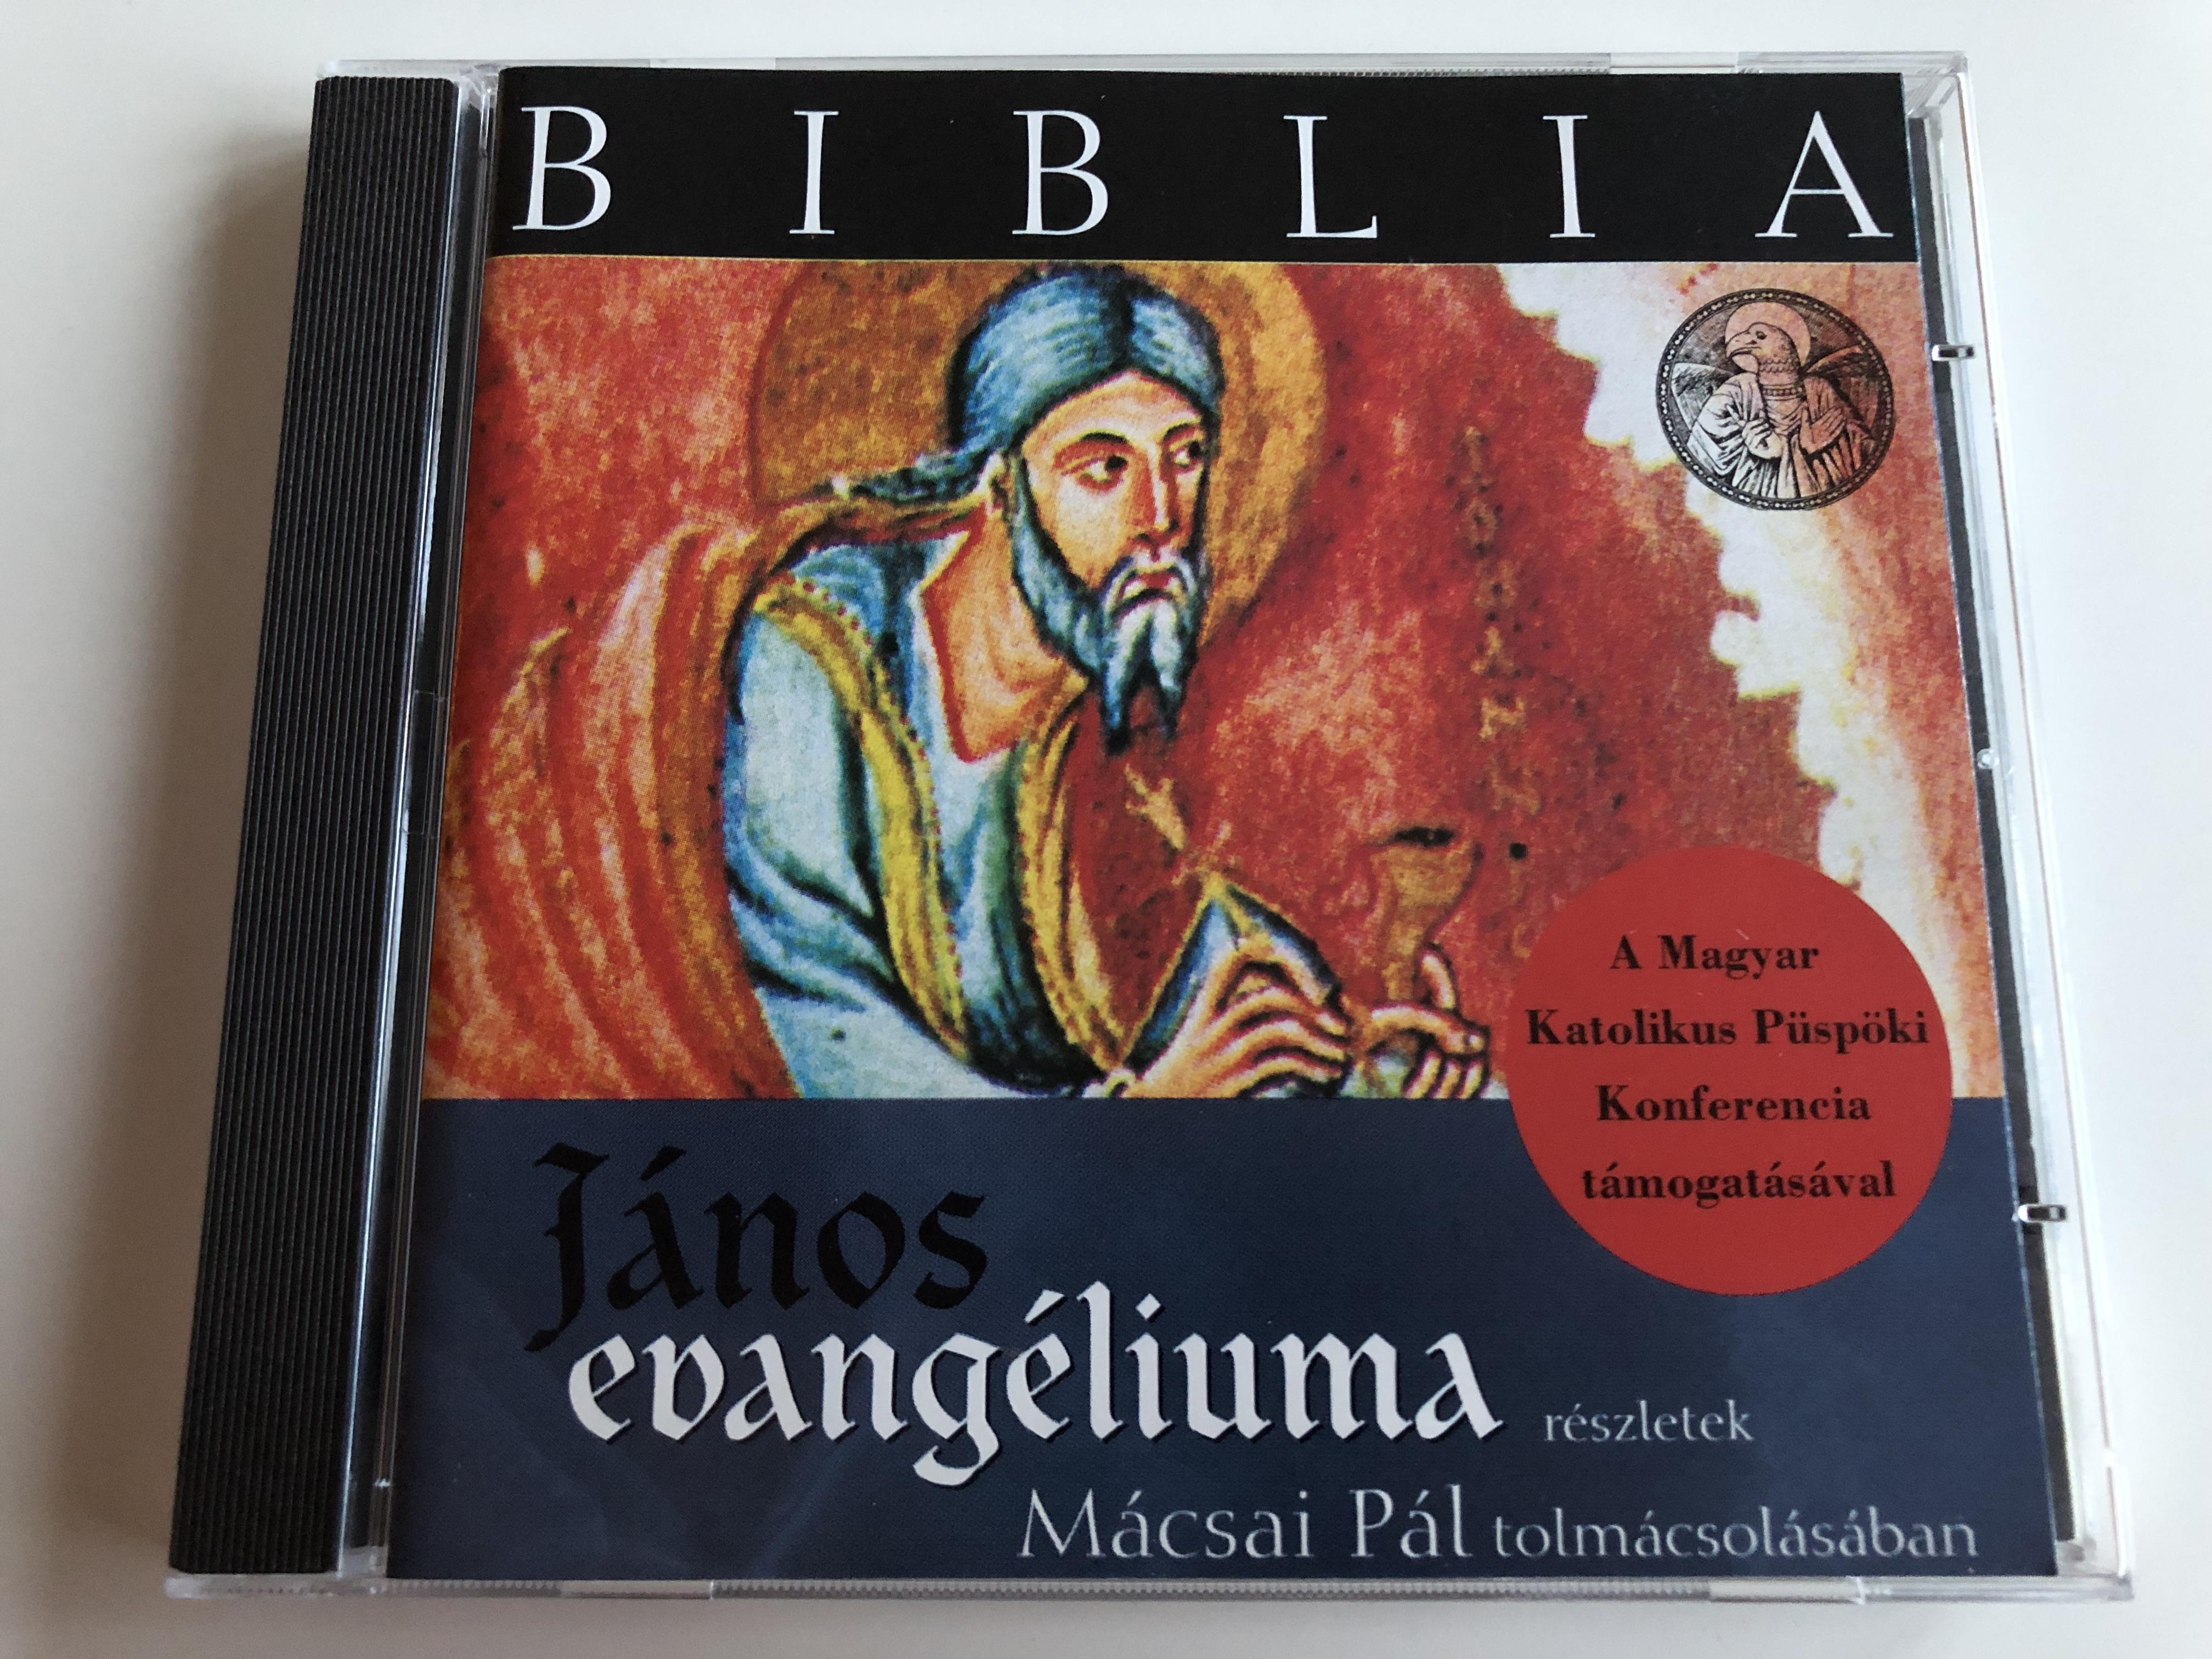 ja-nos-evange-liuma-biblia-cdimg-4341.jpg